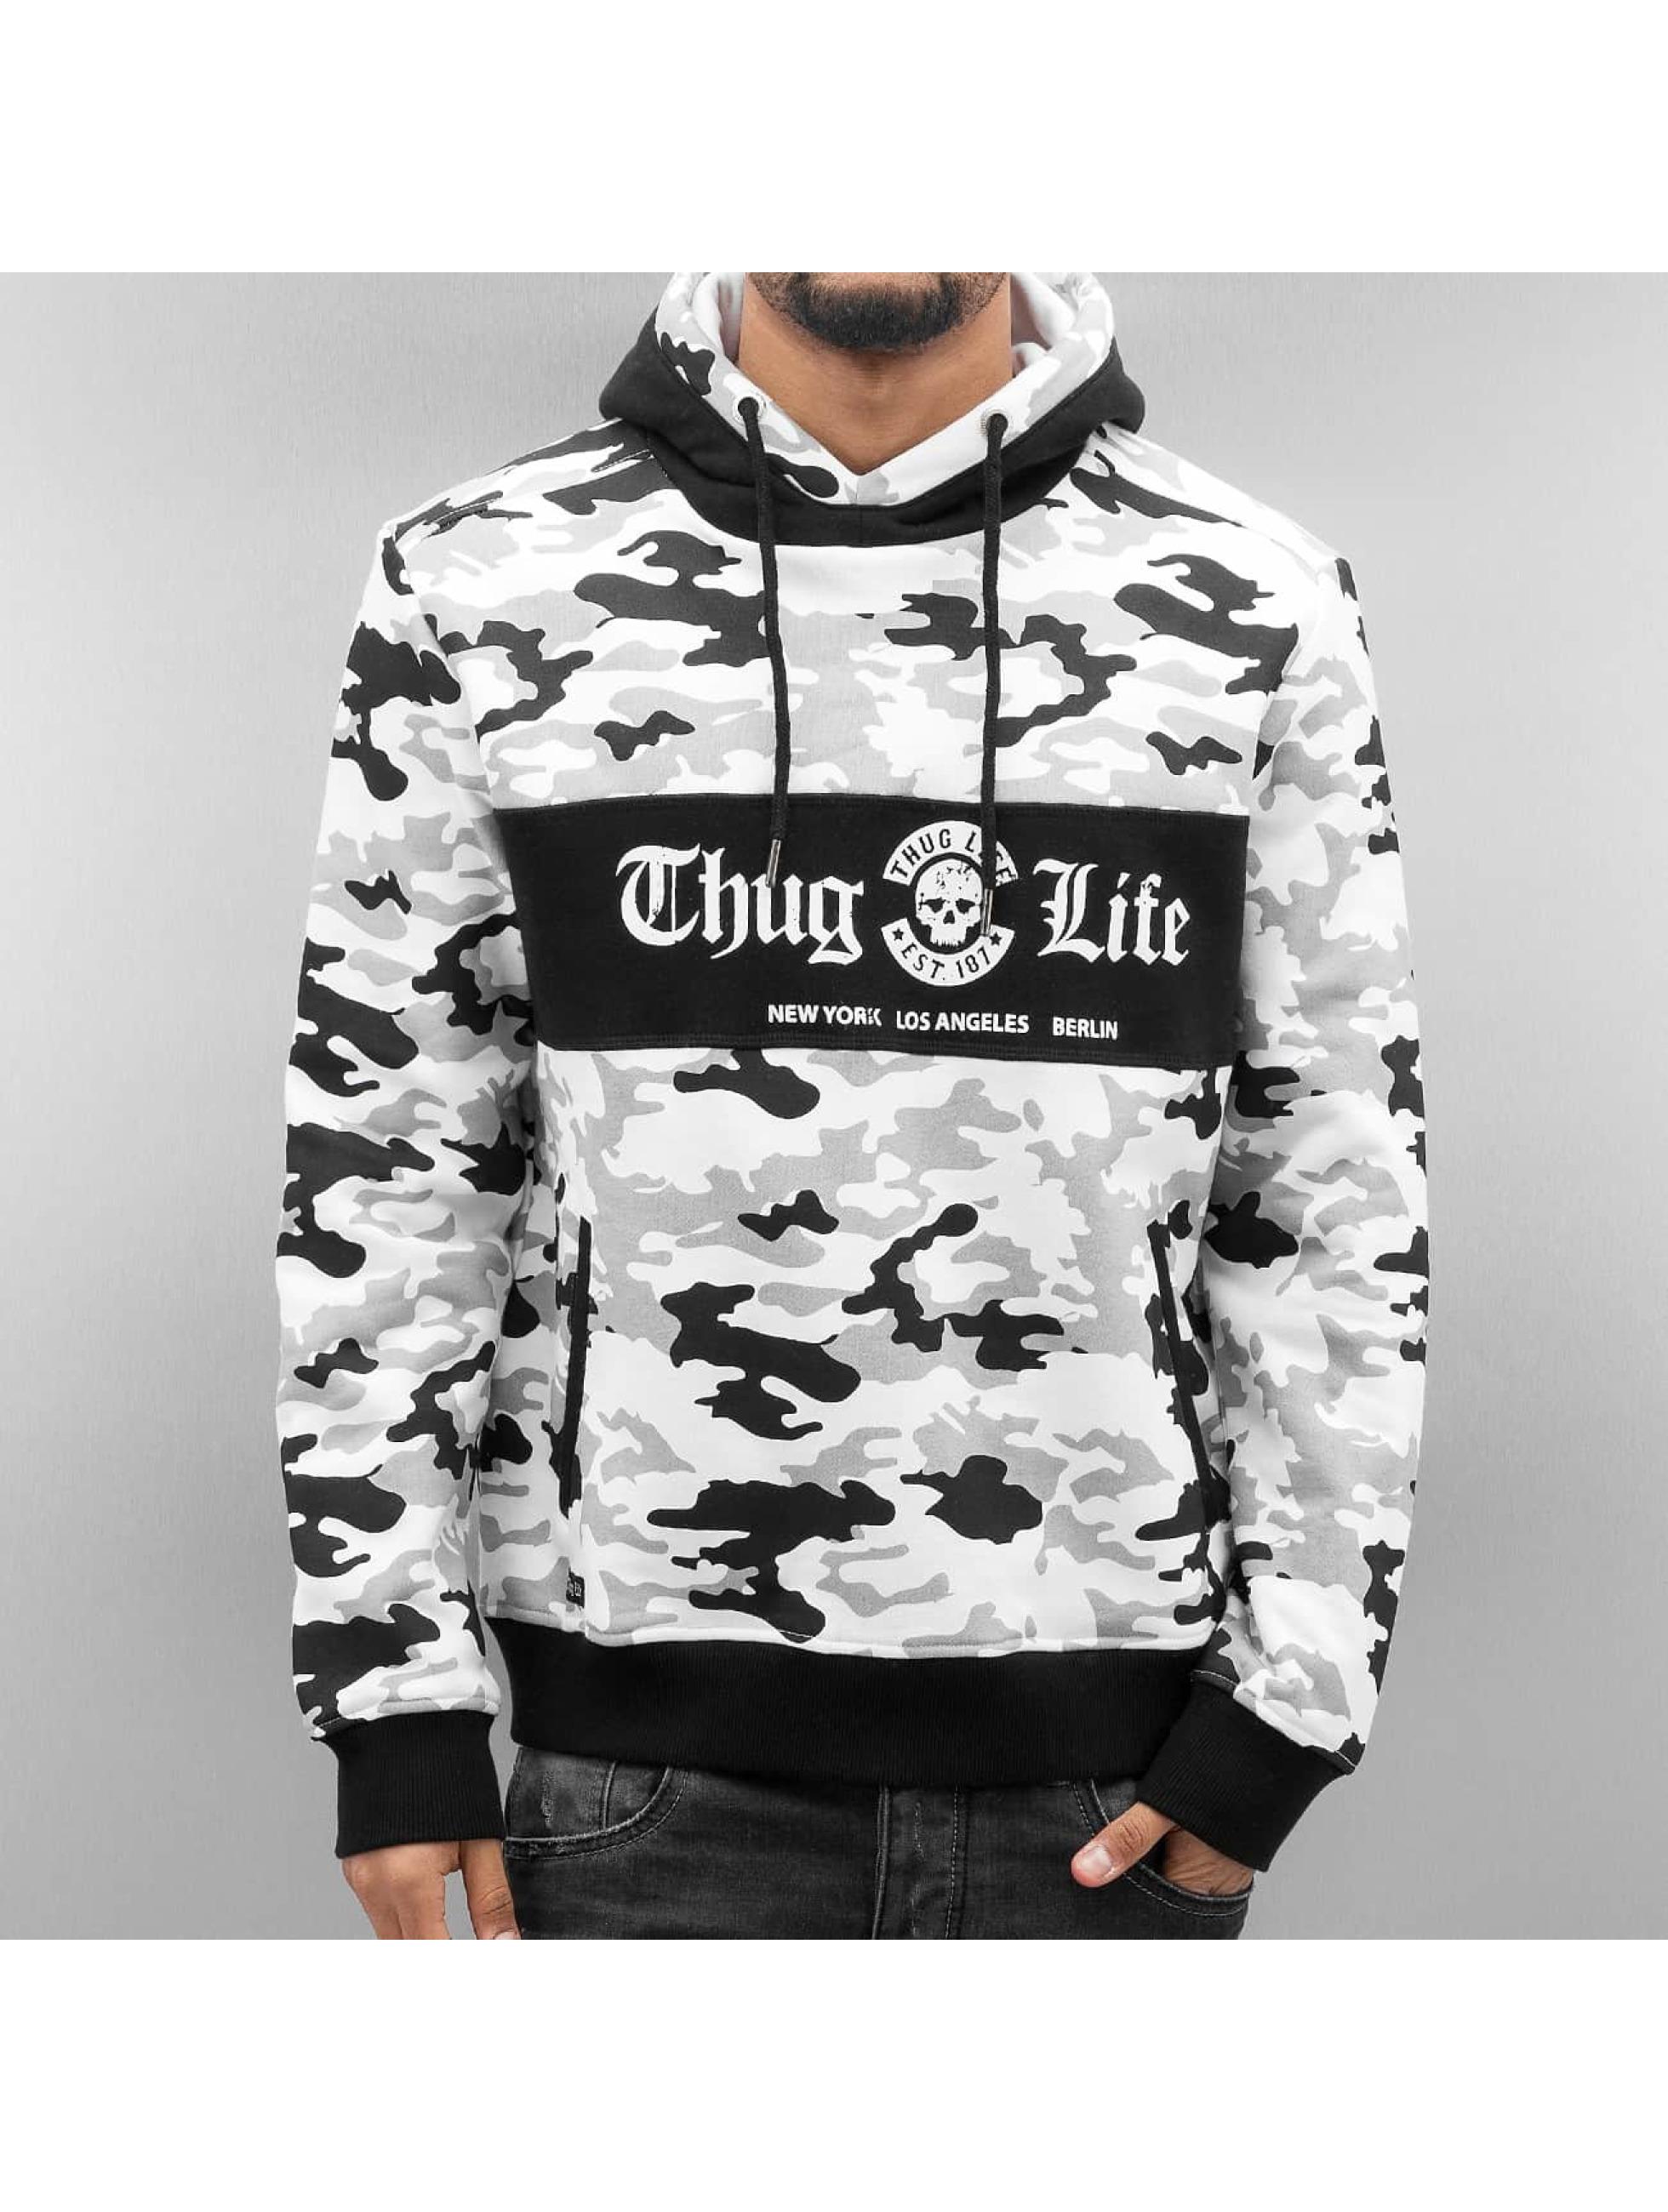 Thug Life / Hoodie Ragthug in white XL